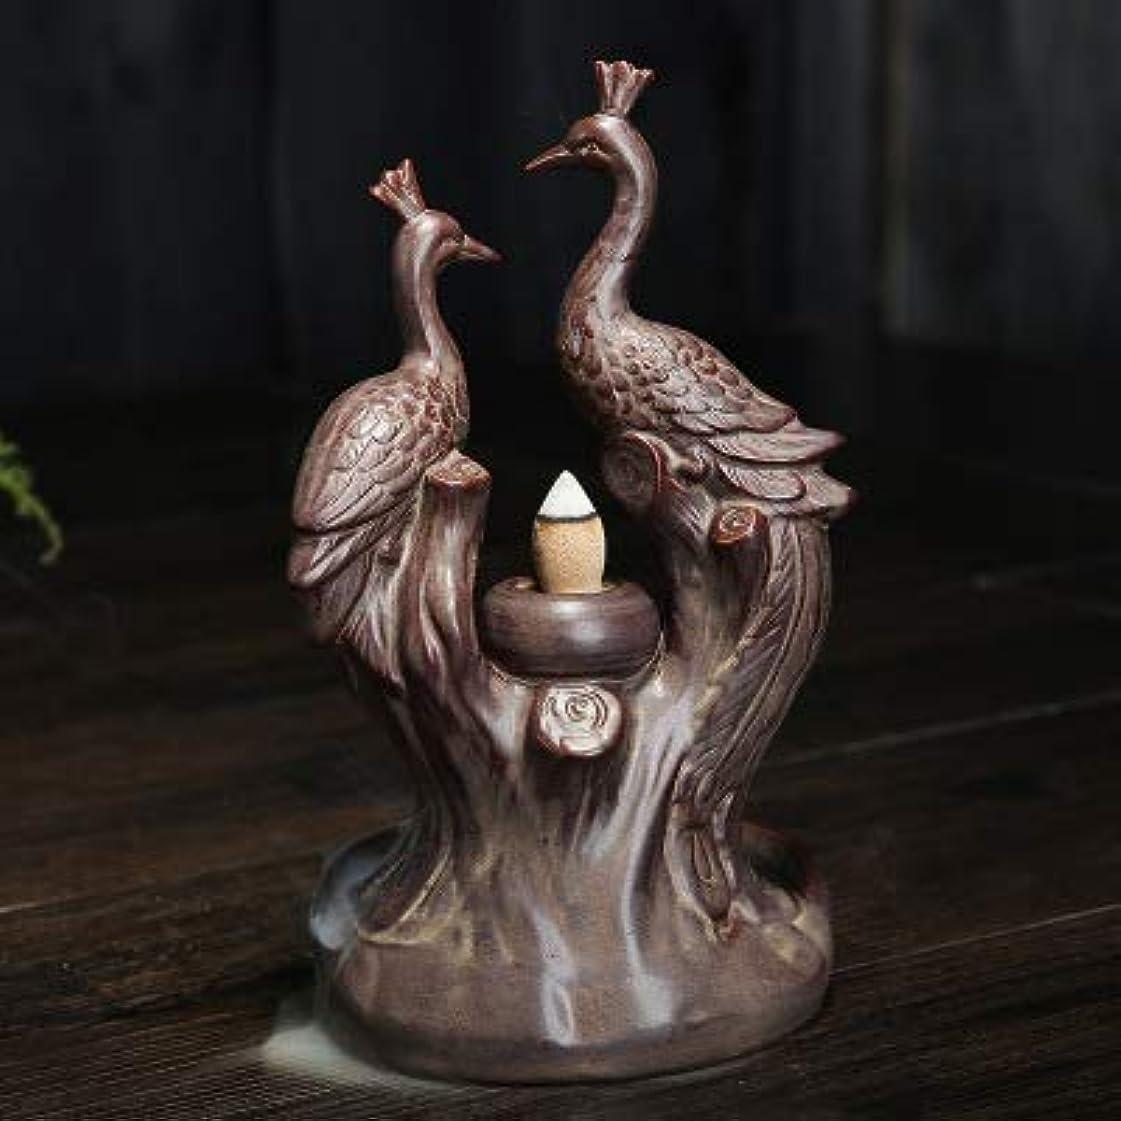 PHILOGOD 香炉 陶器孔雀スタイリング 逆流香炉 香置物 仏壇用香立て/香皿